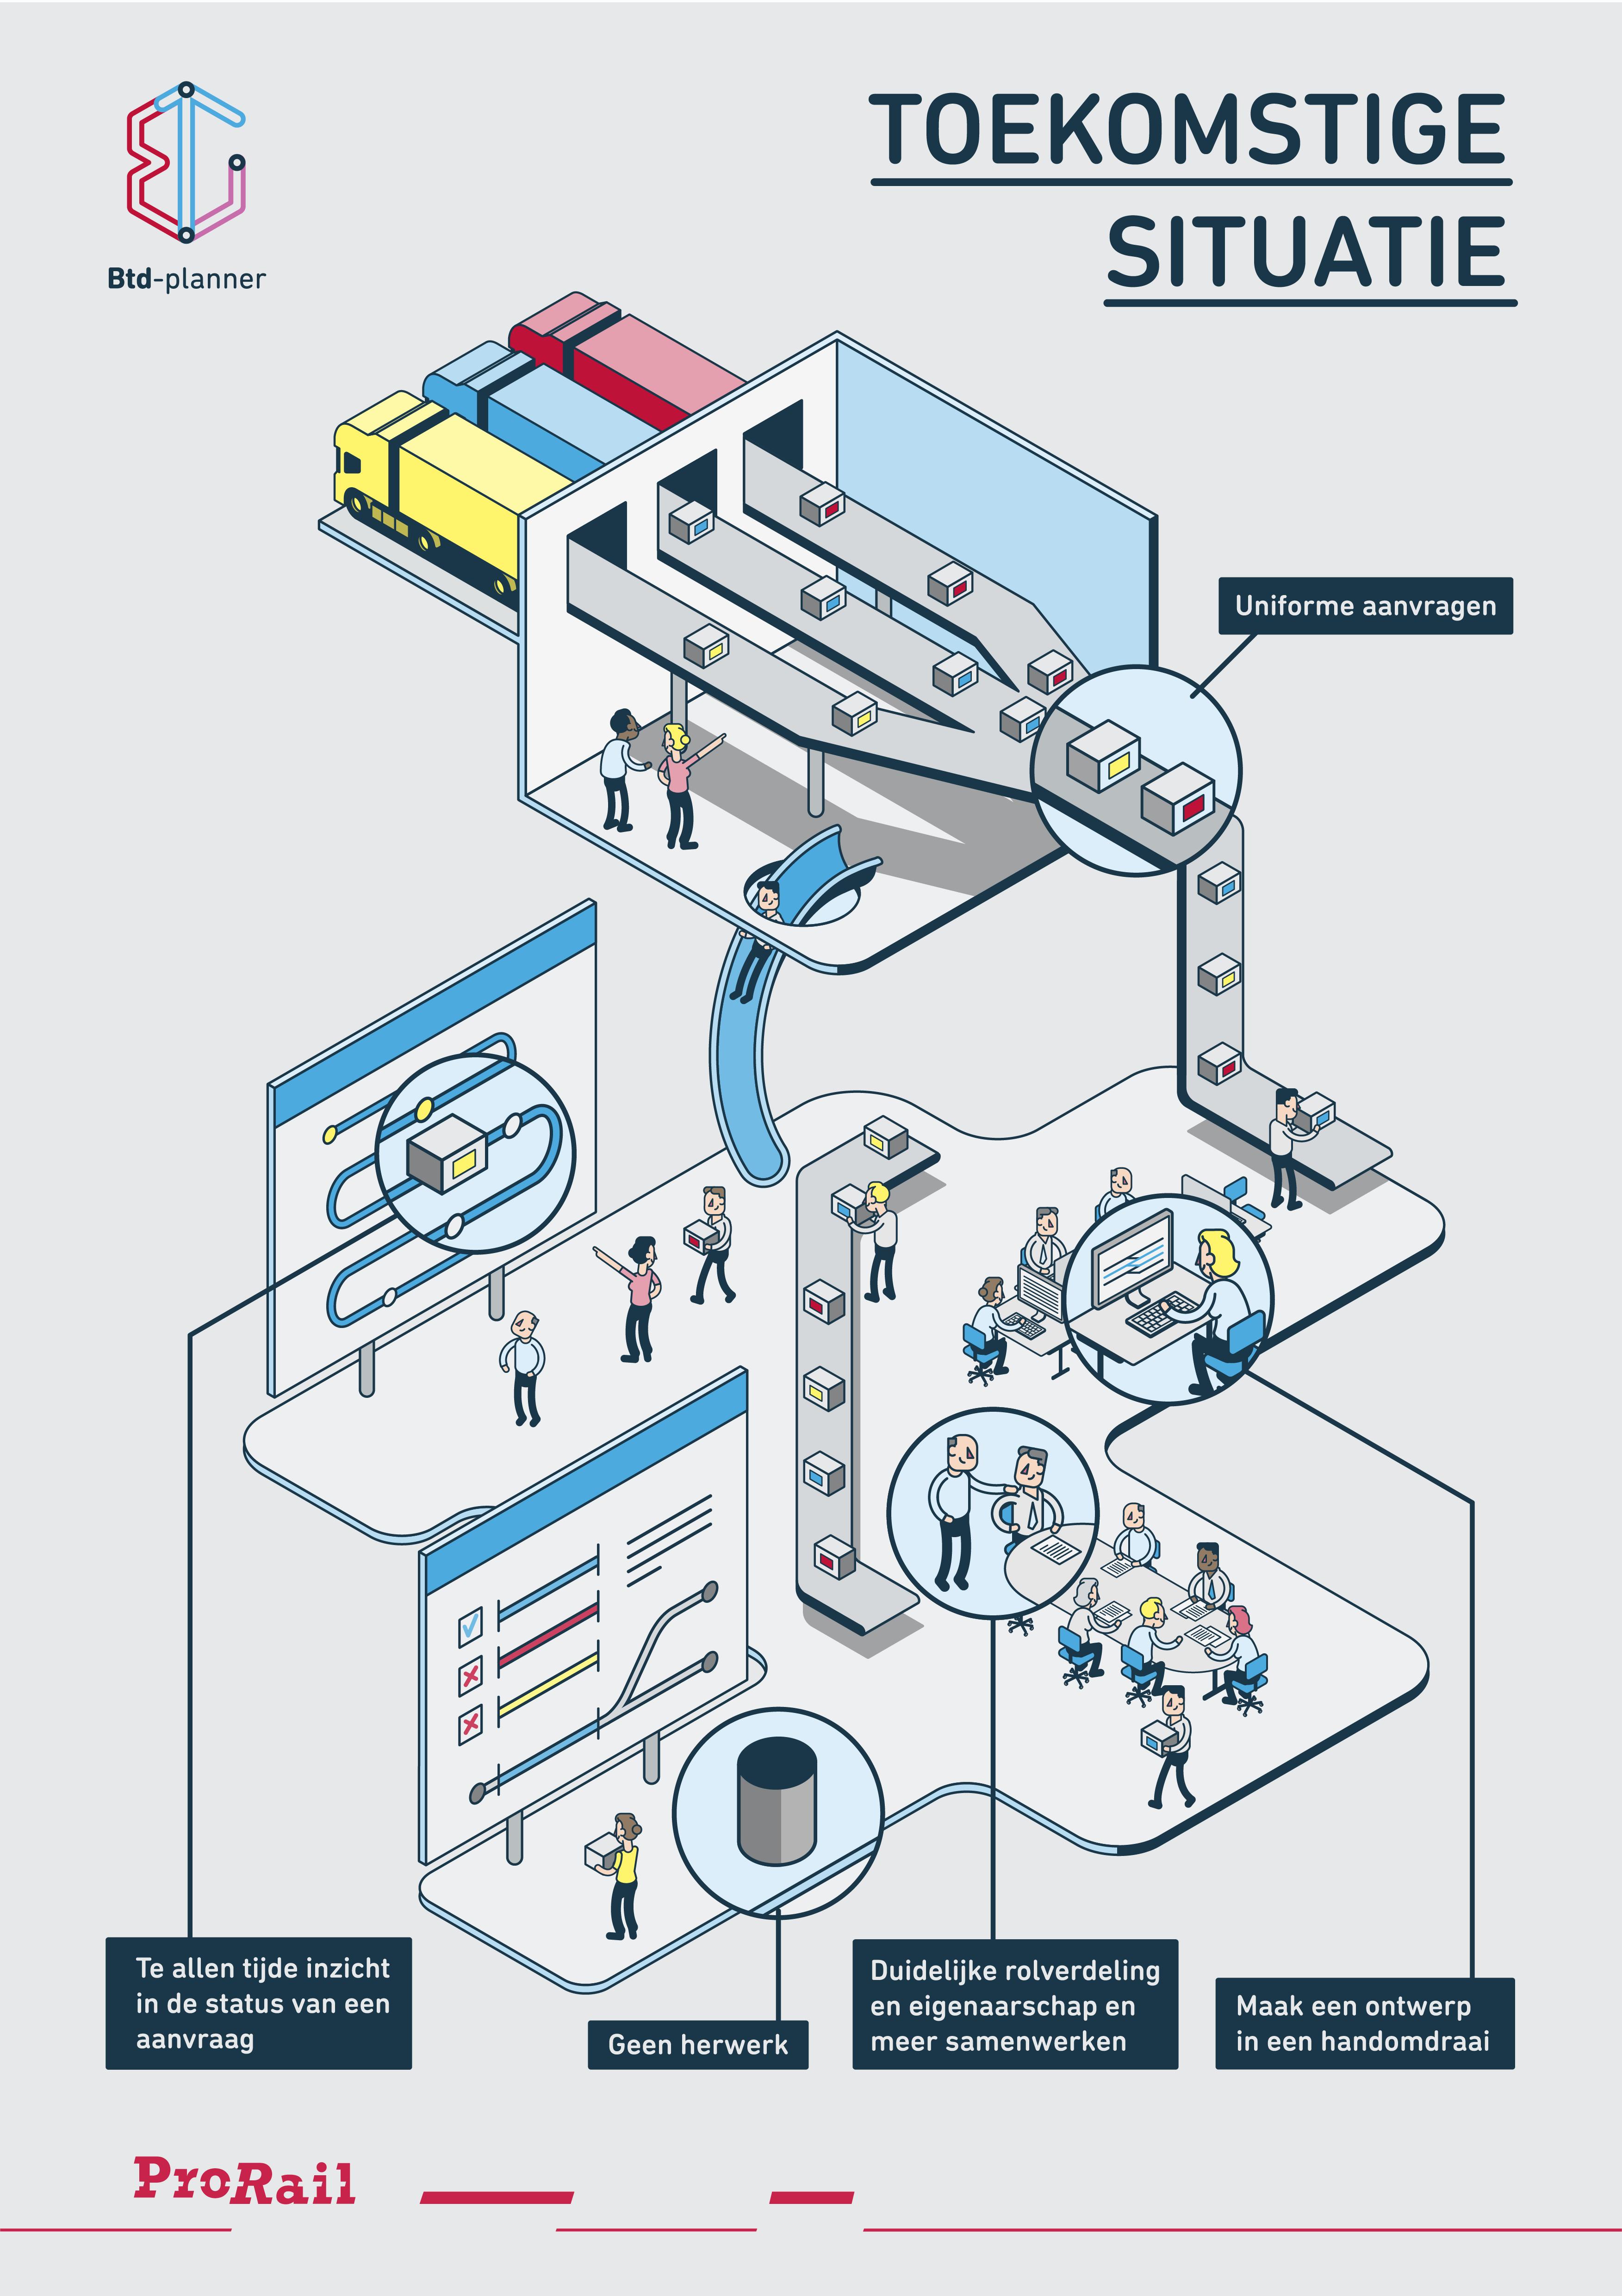 Infographic BTD planner Toekomst